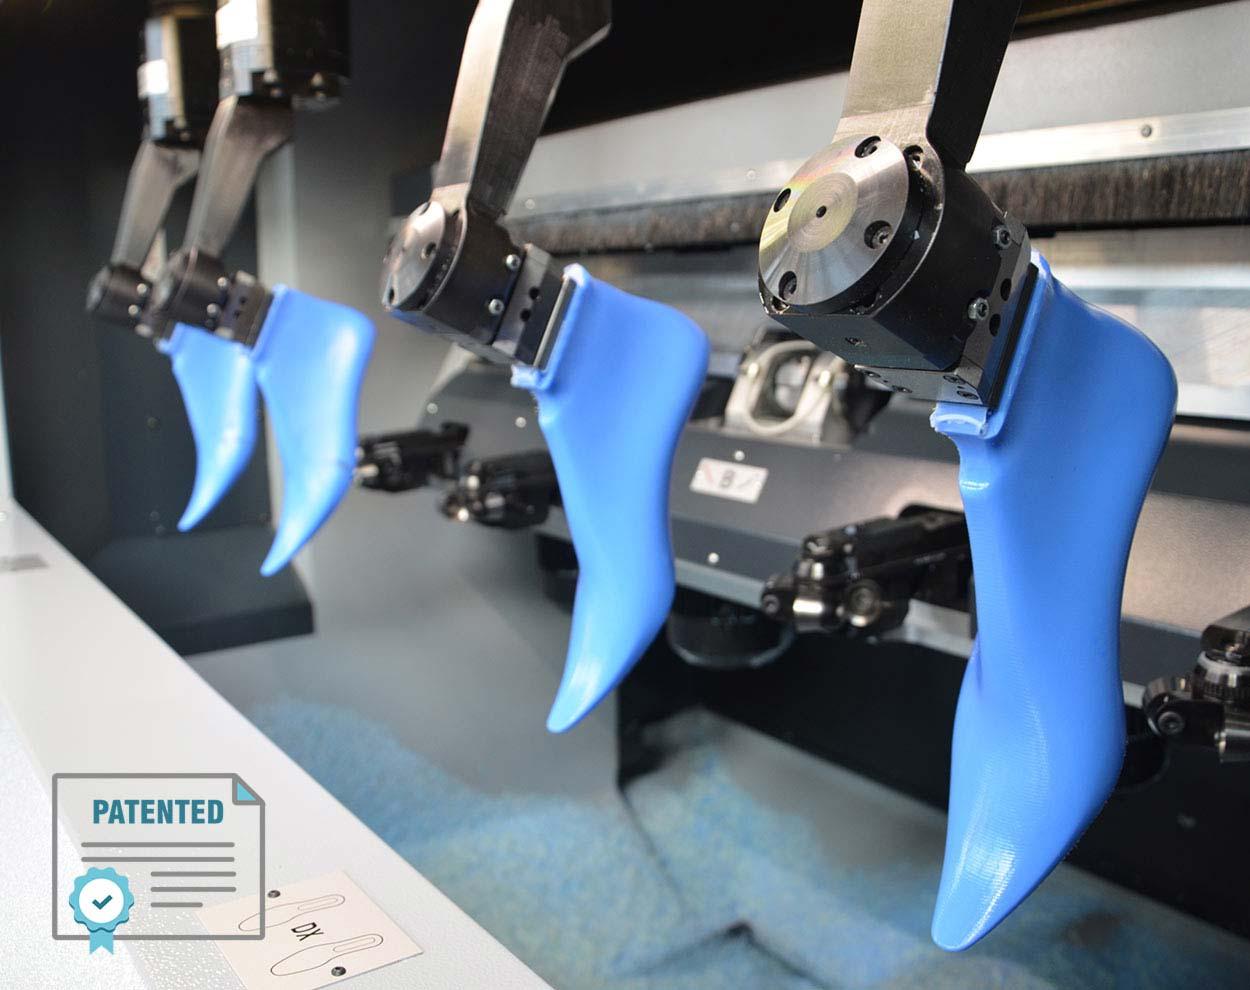 SDF system - Newlast patent